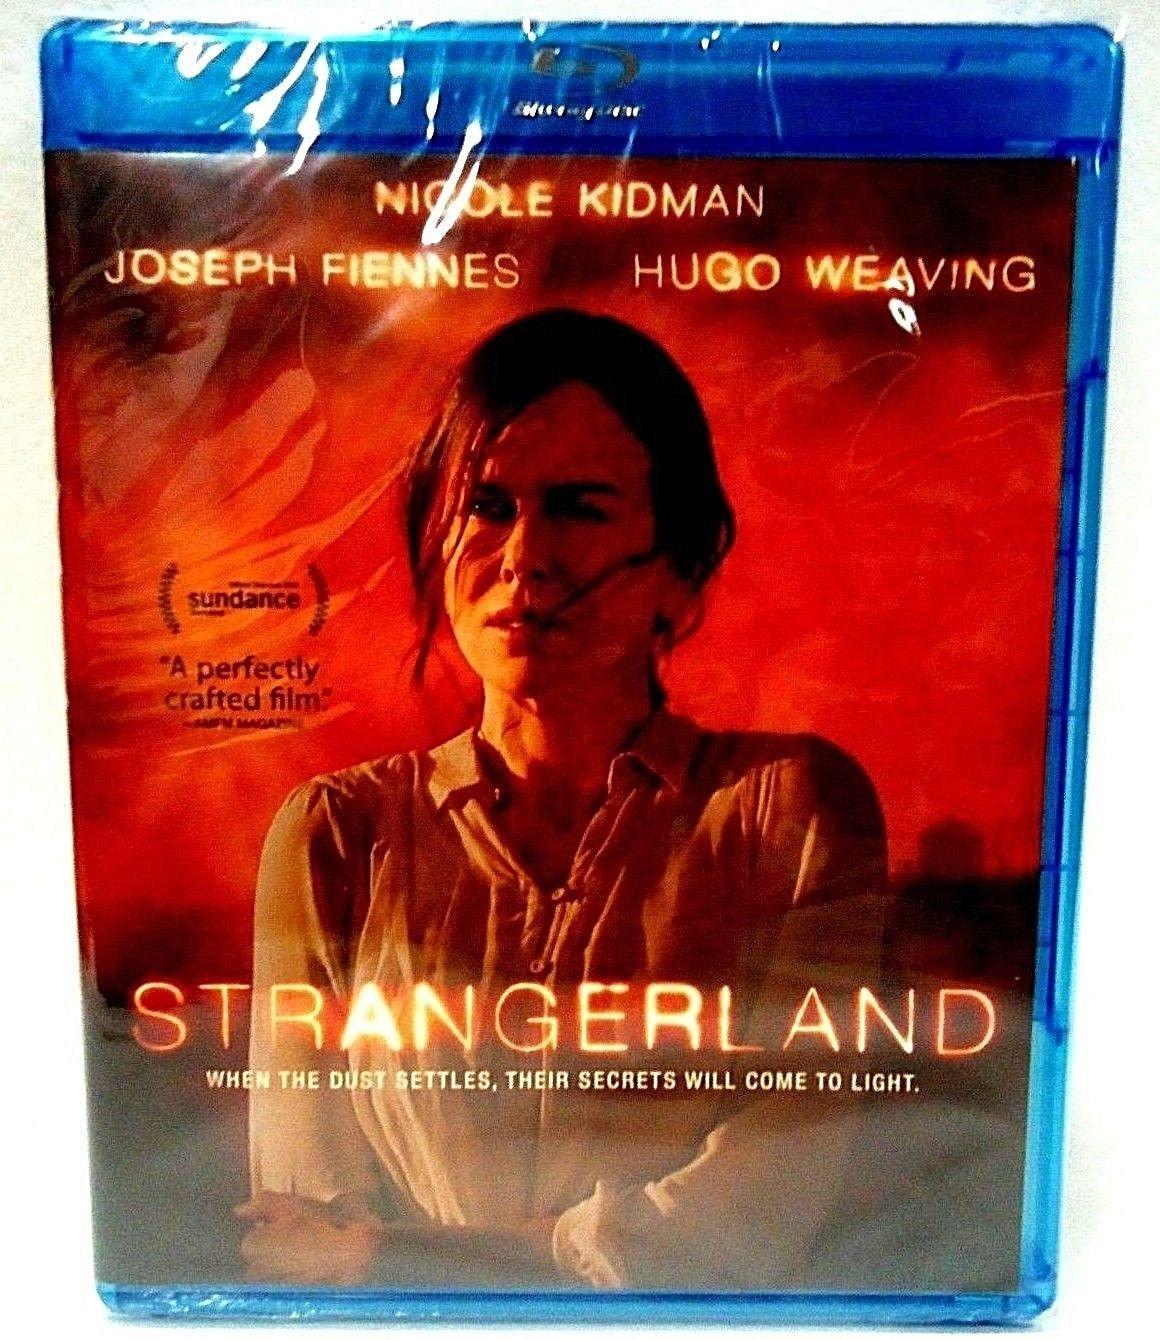 STRANGERLAND - BLU-RAY - DVD - NICOLE KIDMAN - NEW - MYSTERY - THRILLER - MOVIE